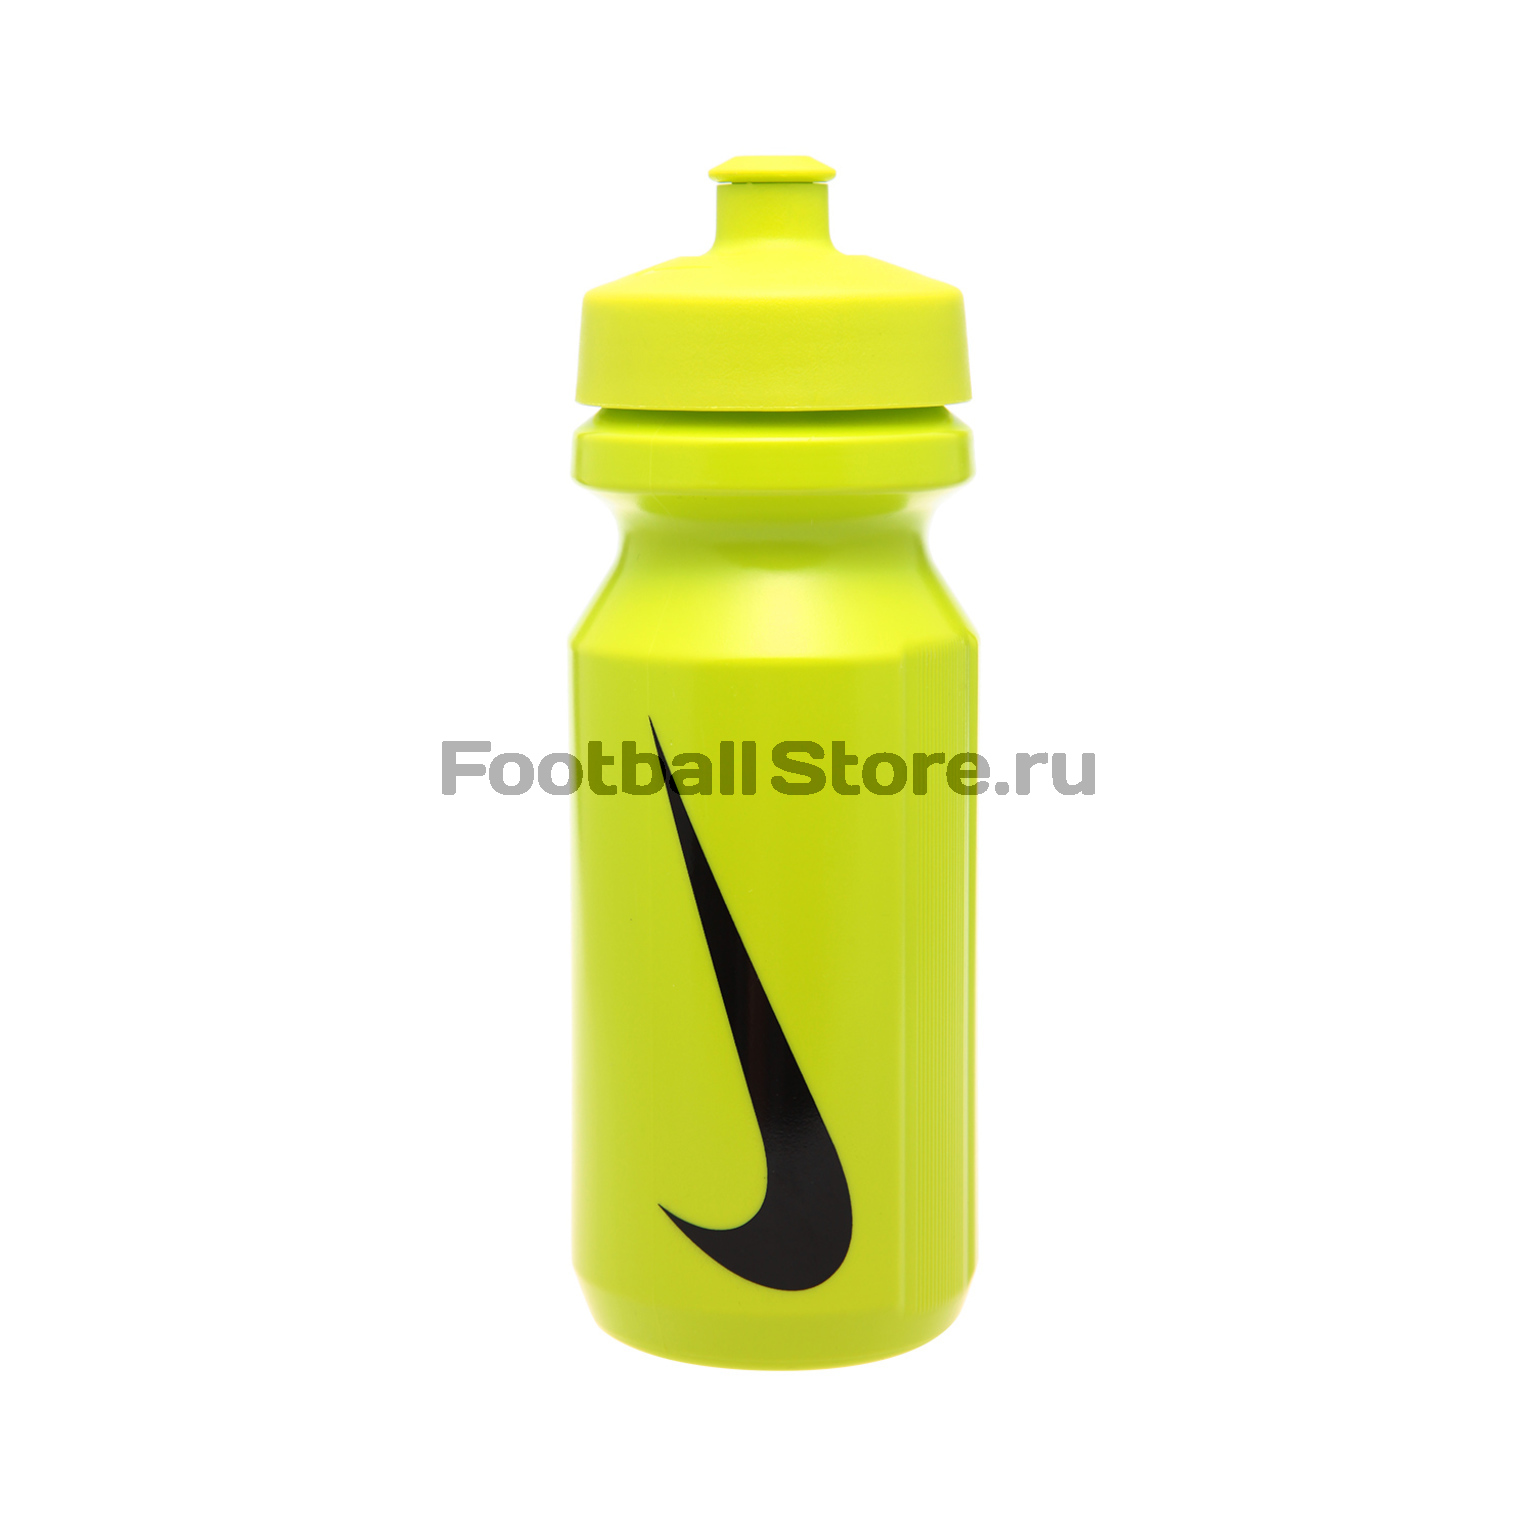 Бутылка для воды Nike Big Water 220 Z N.OB.17.316.22 бутылка для воды nike 0 65 л big mouth water bottle nob17 968 прозр чер